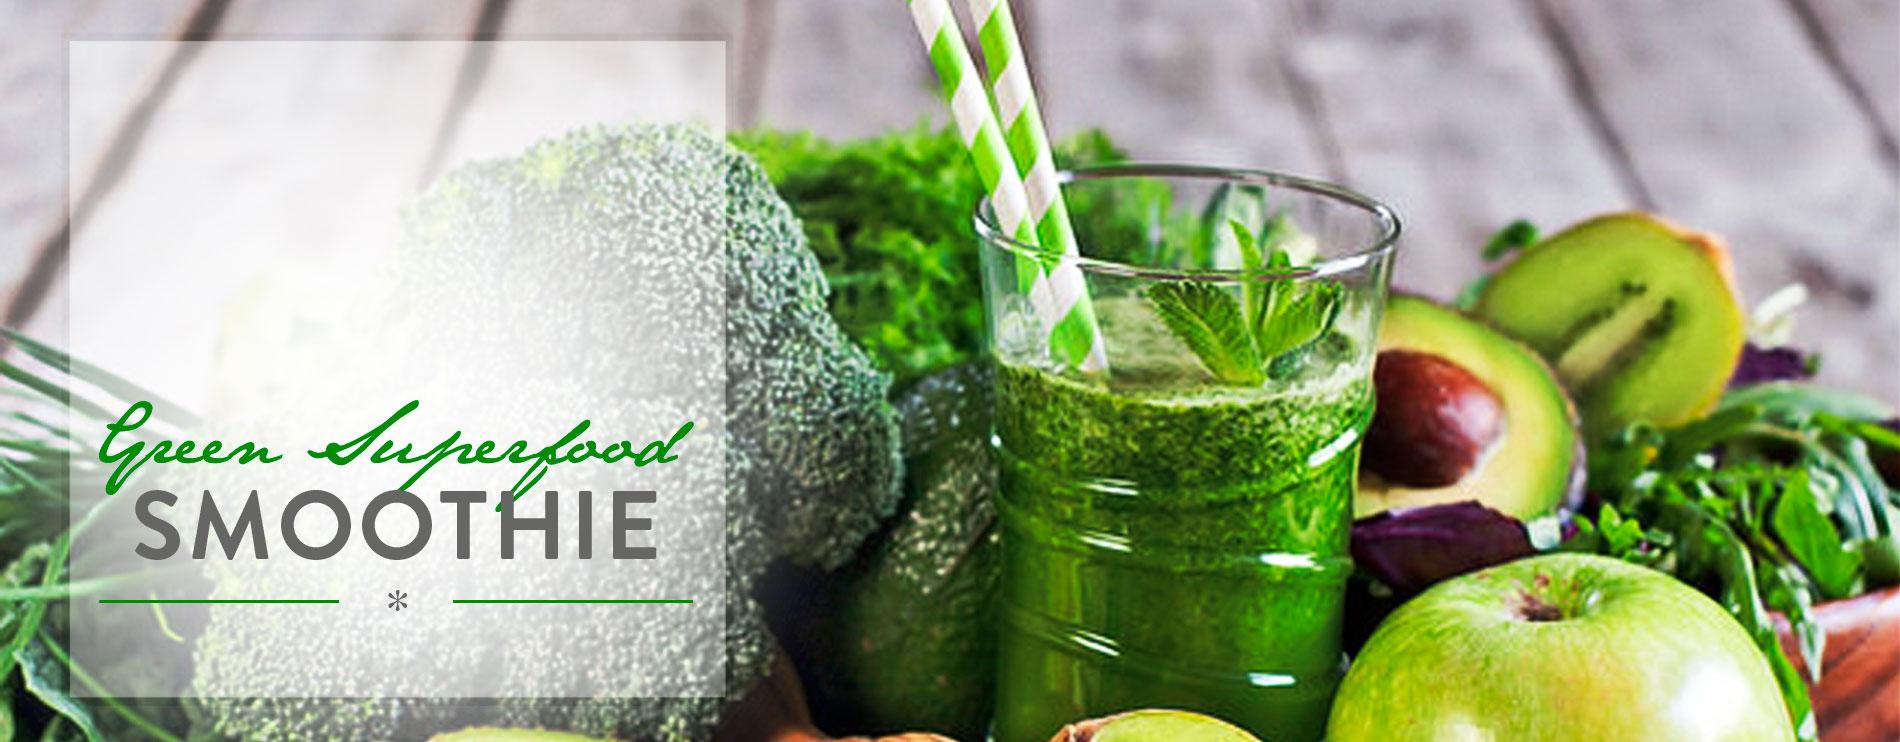 green superfood smoothie rezept auf westwing. Black Bedroom Furniture Sets. Home Design Ideas